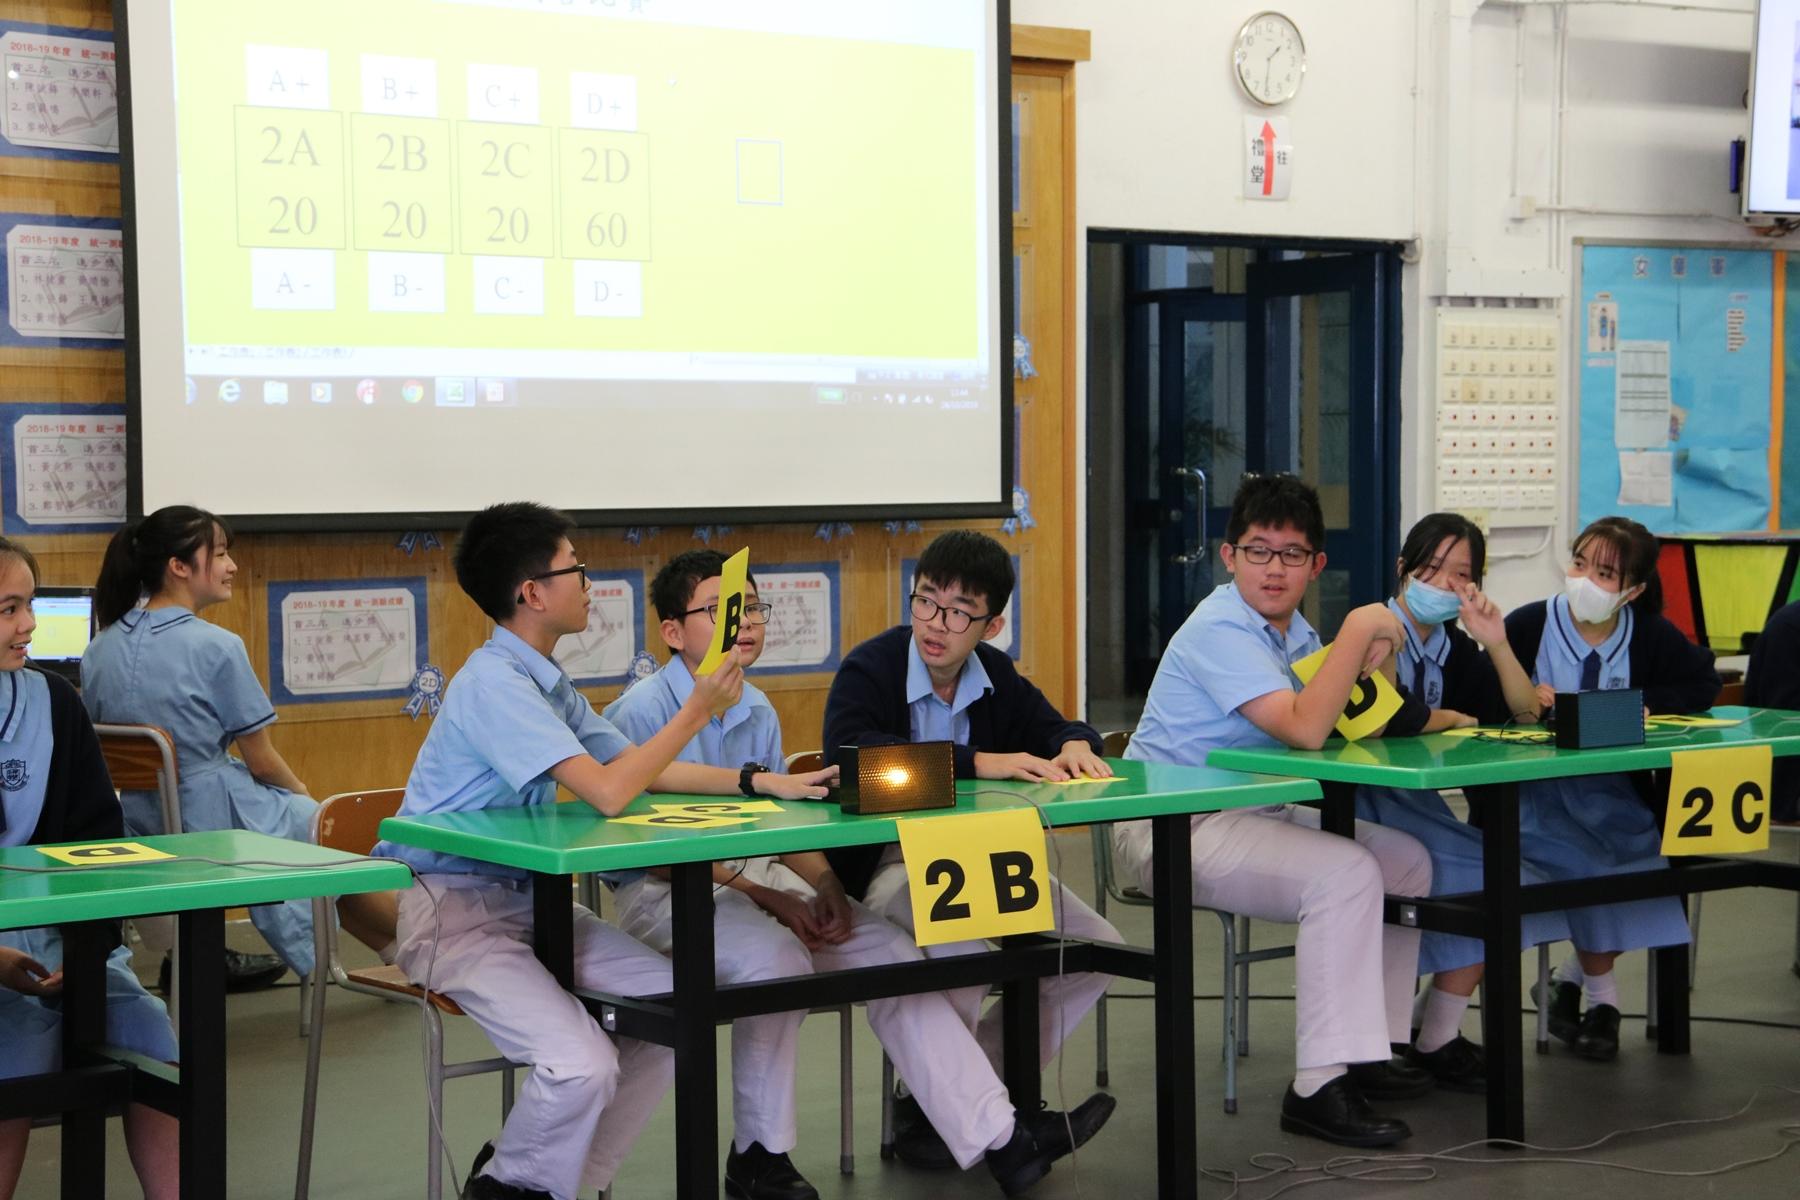 http://npc.edu.hk/sites/default/files/img_6120.jpg